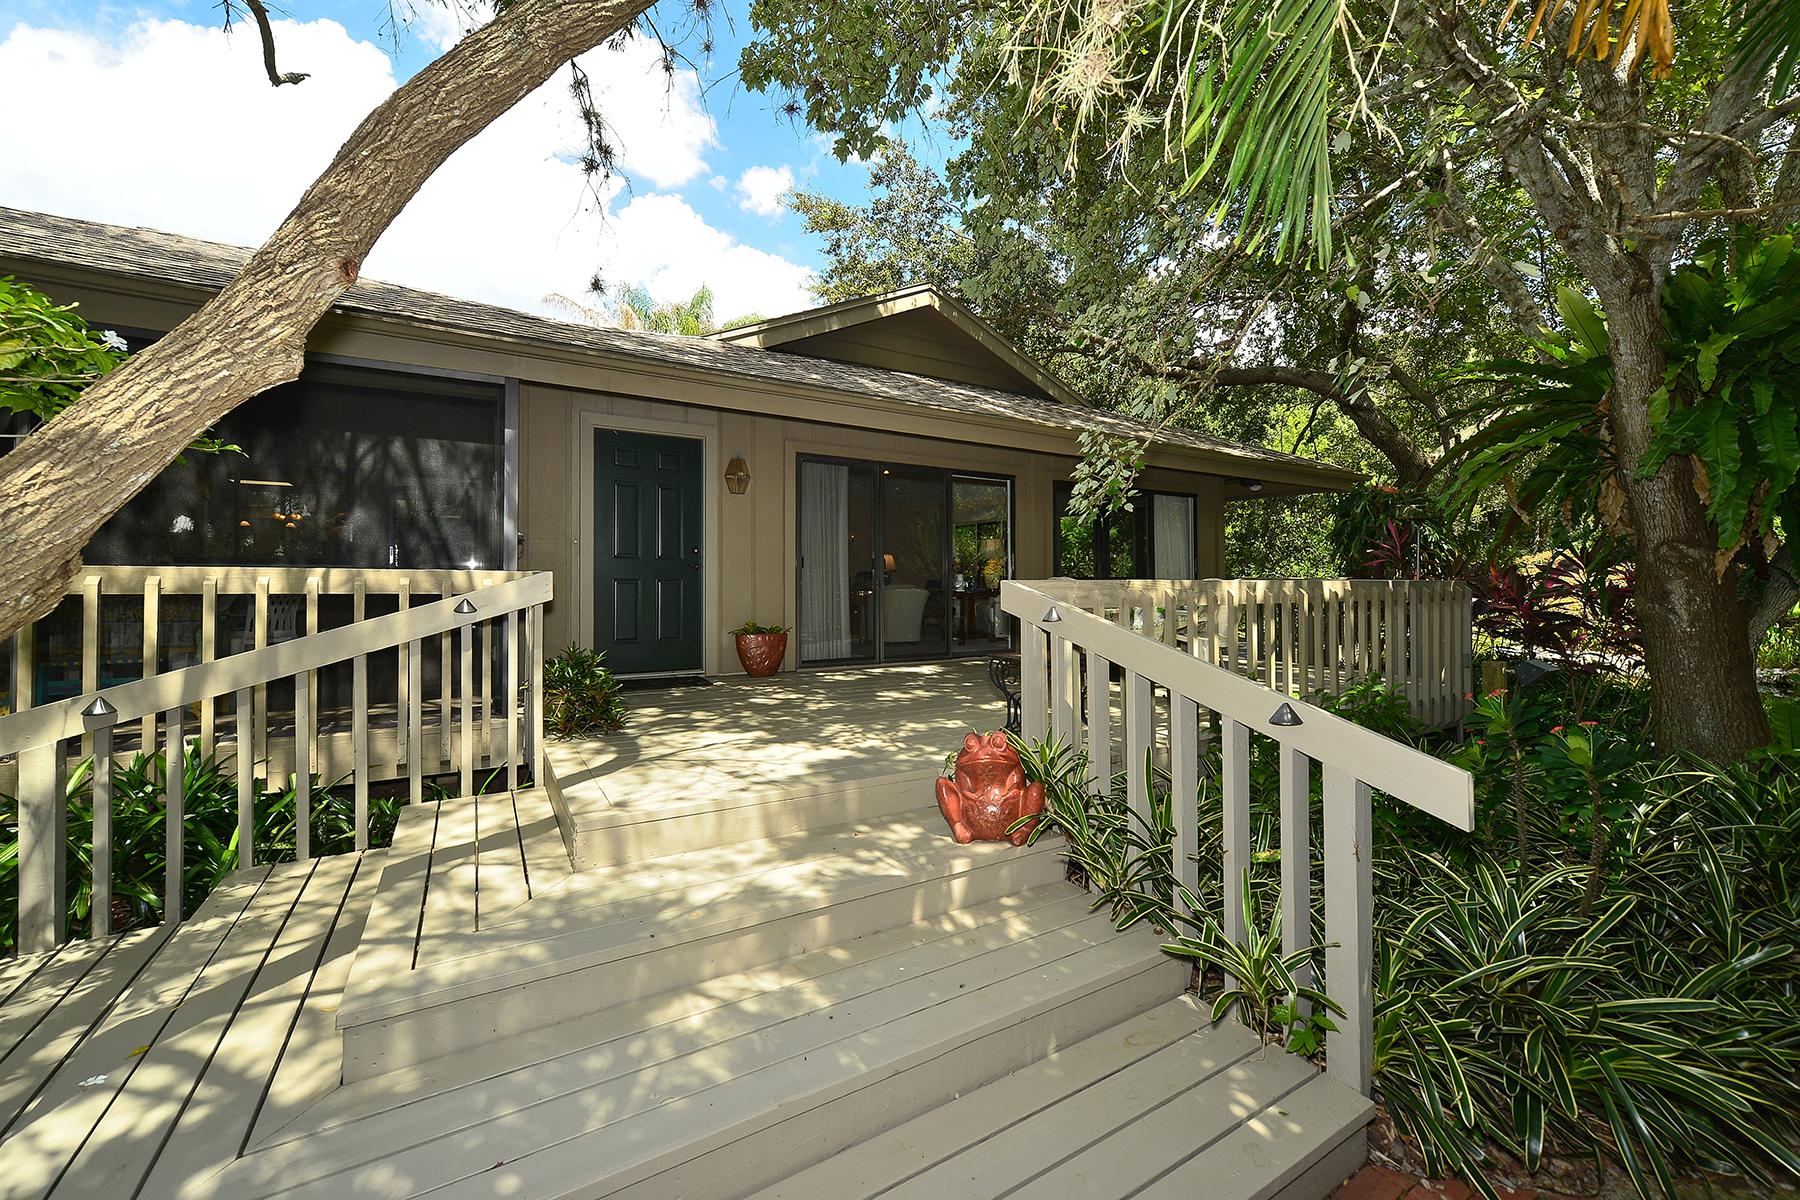 Single Family Home for Sale at SOUTH SARASOTA 1655 Quail Dr, Sarasota, Florida 34231 United States